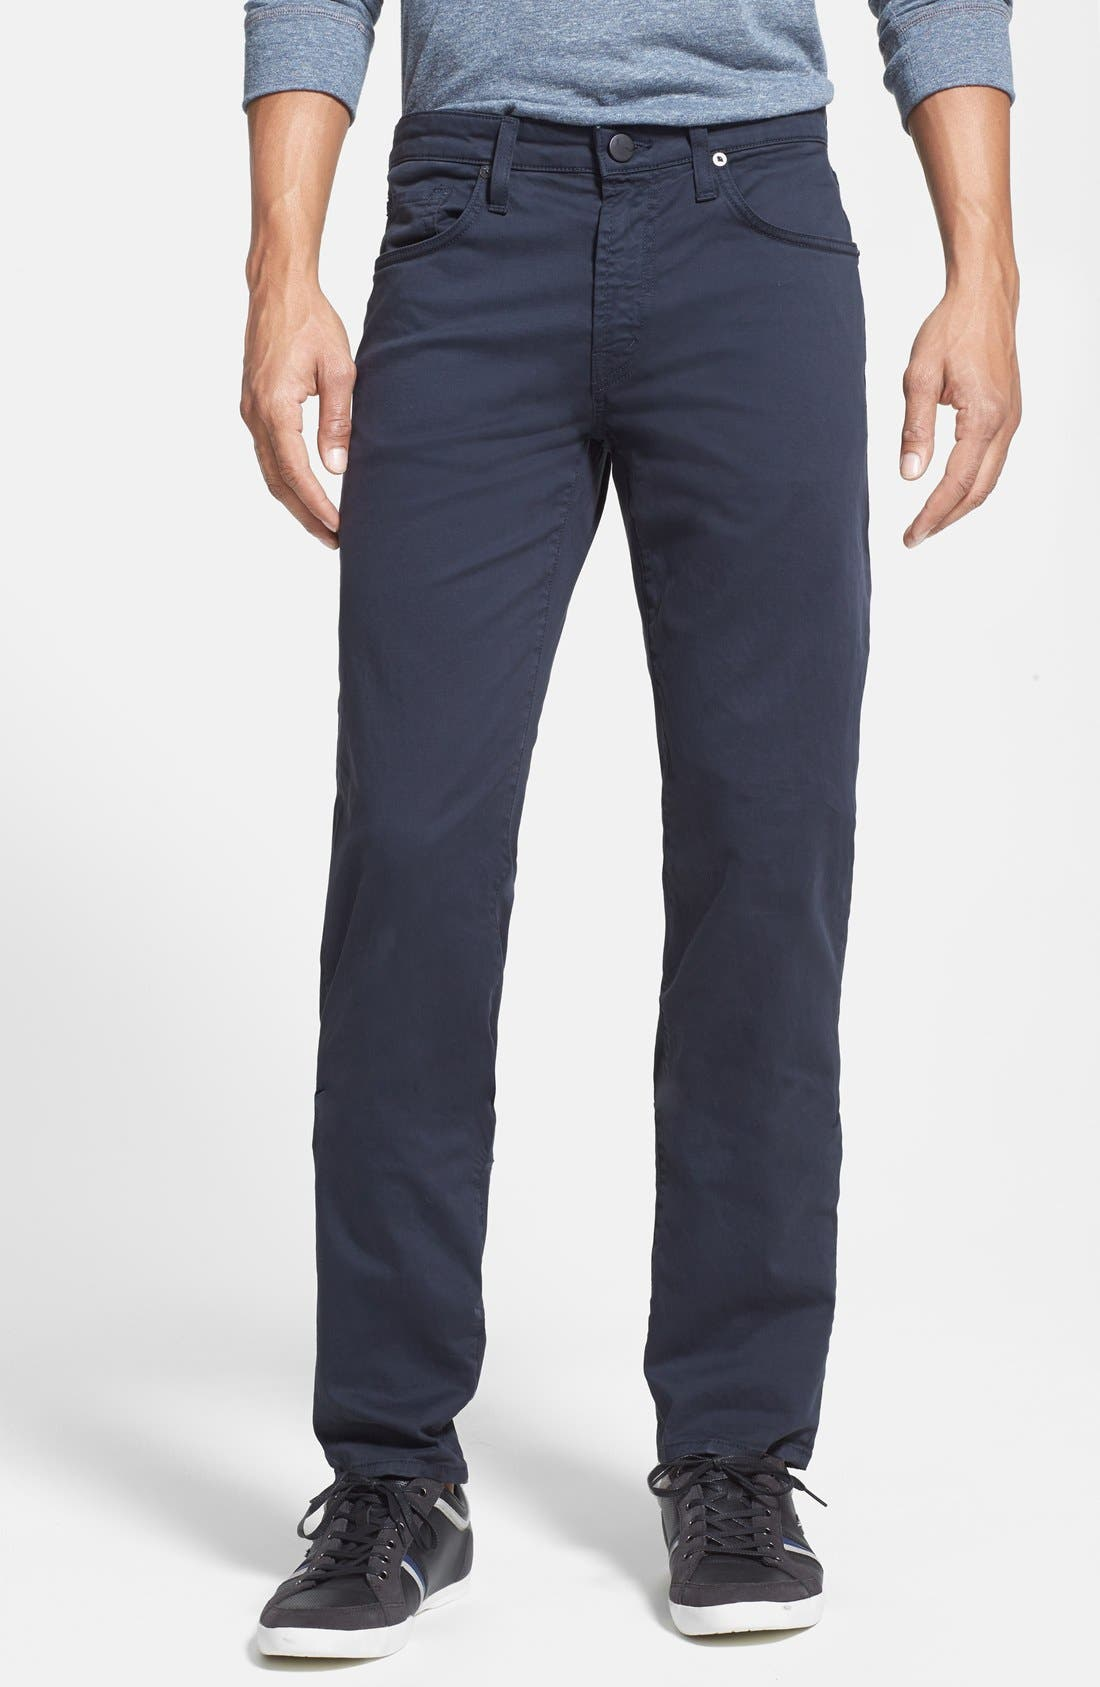 'Kane' Slim Fit Cotton Twill Pants,                             Main thumbnail 19, color,